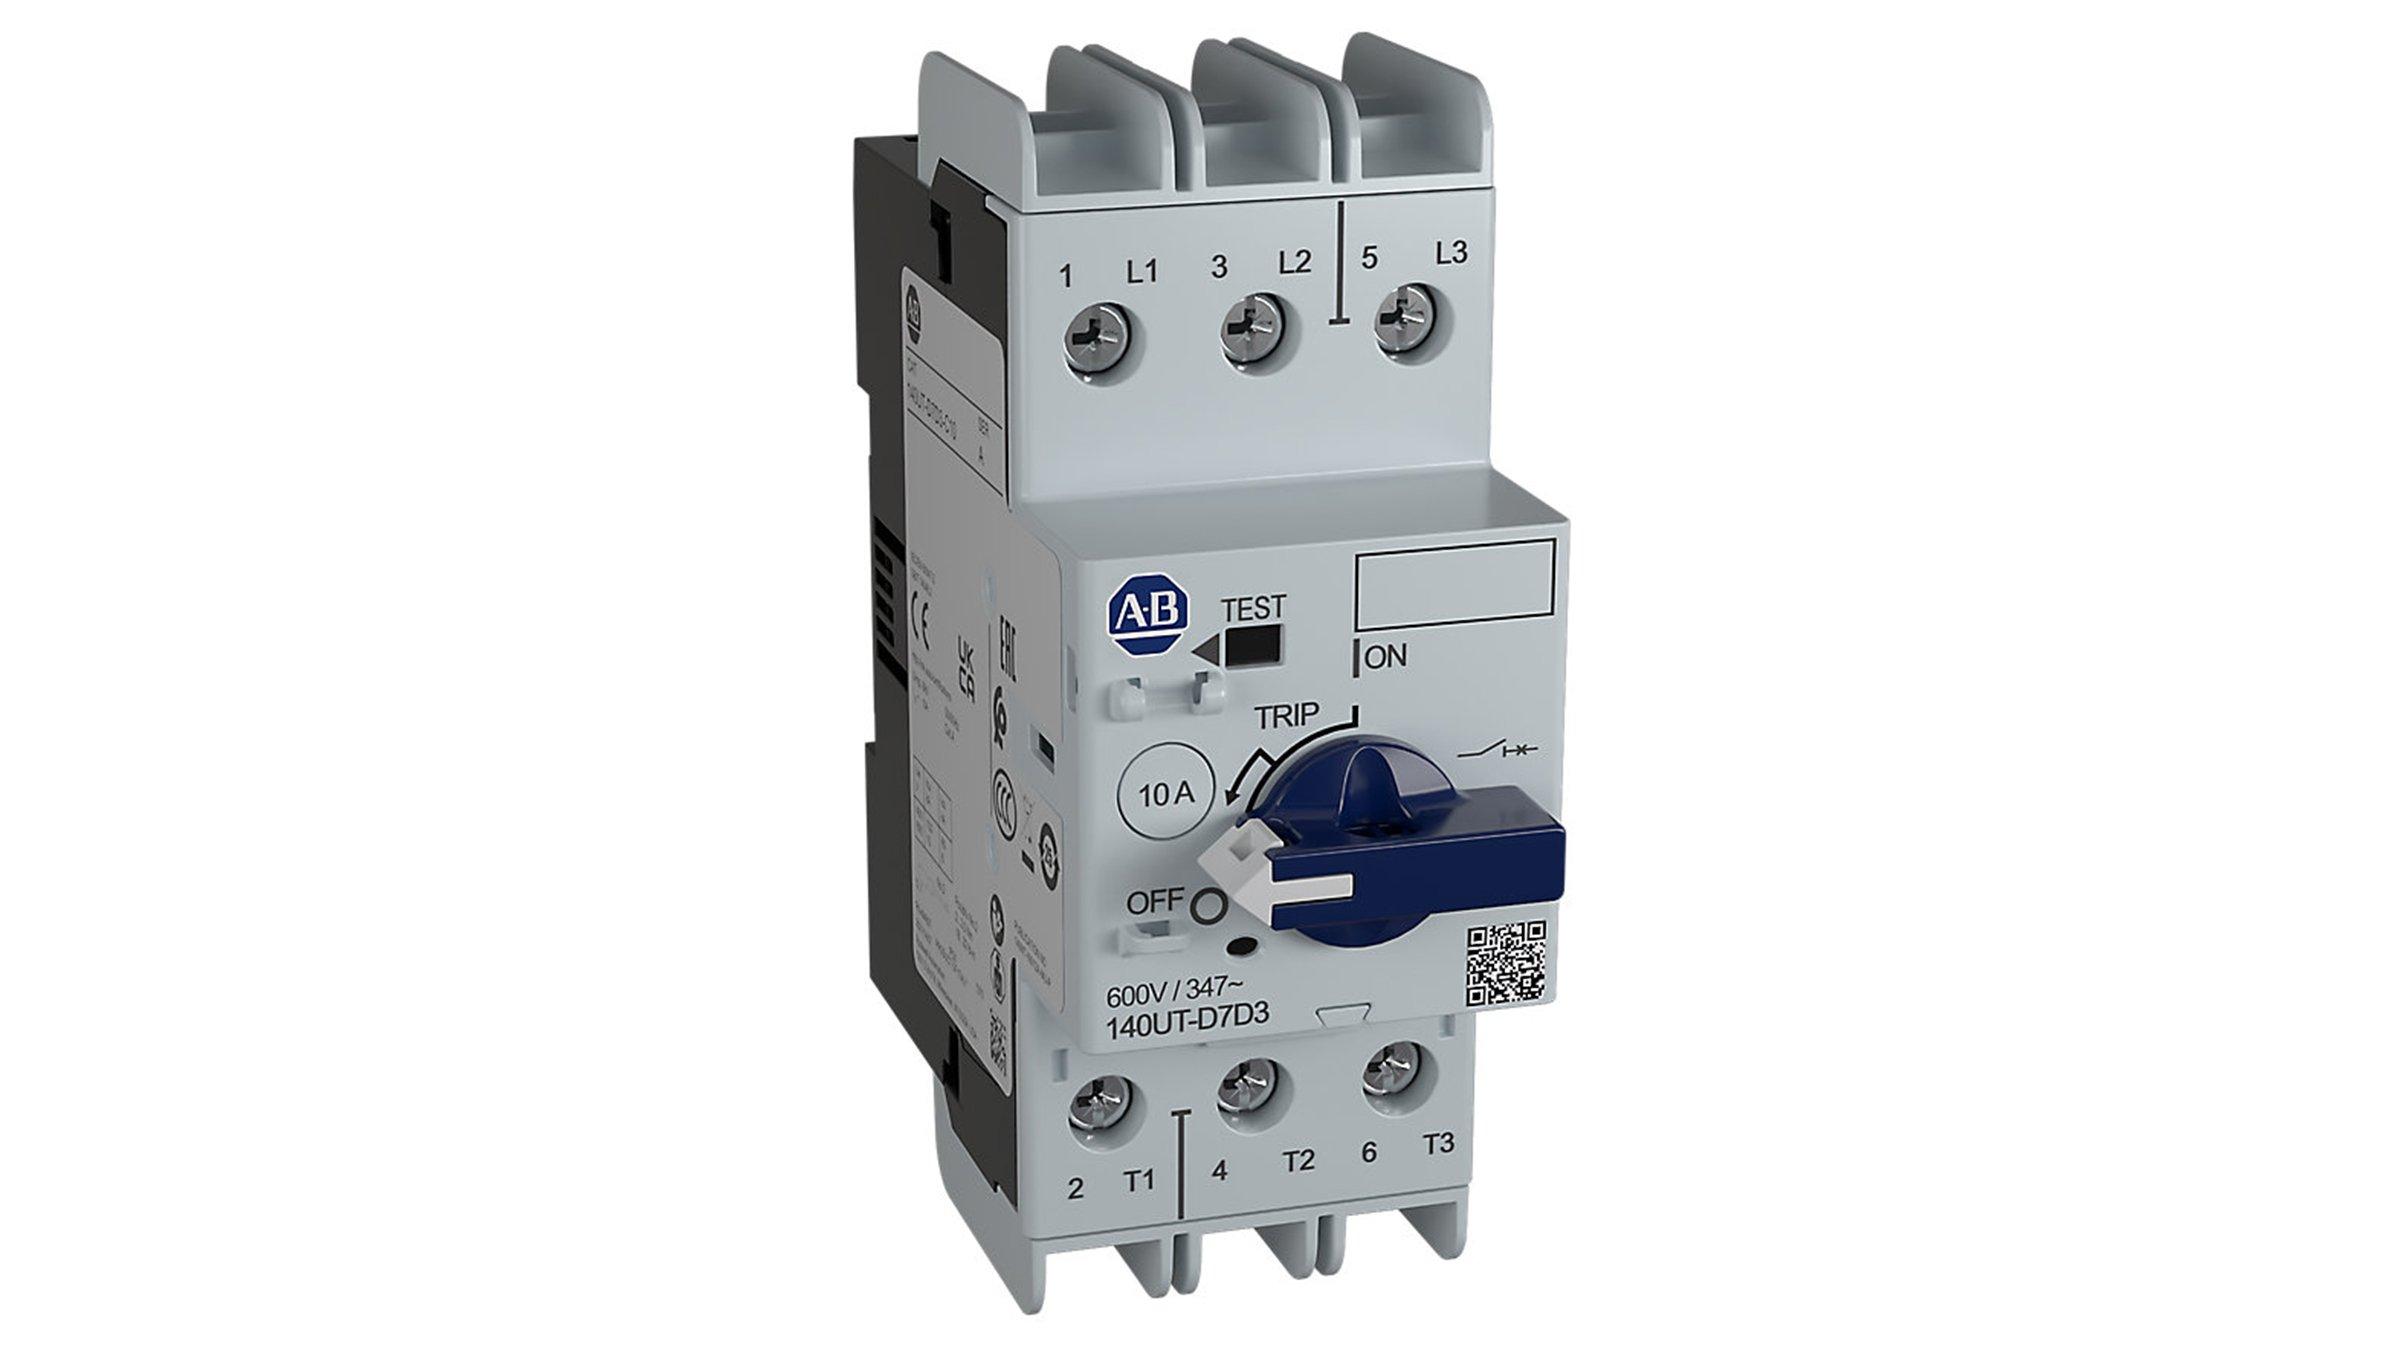 Bulletin 140UT Molded Case Circuit Breakers showing lockable knob and short circuit trip indicator flag